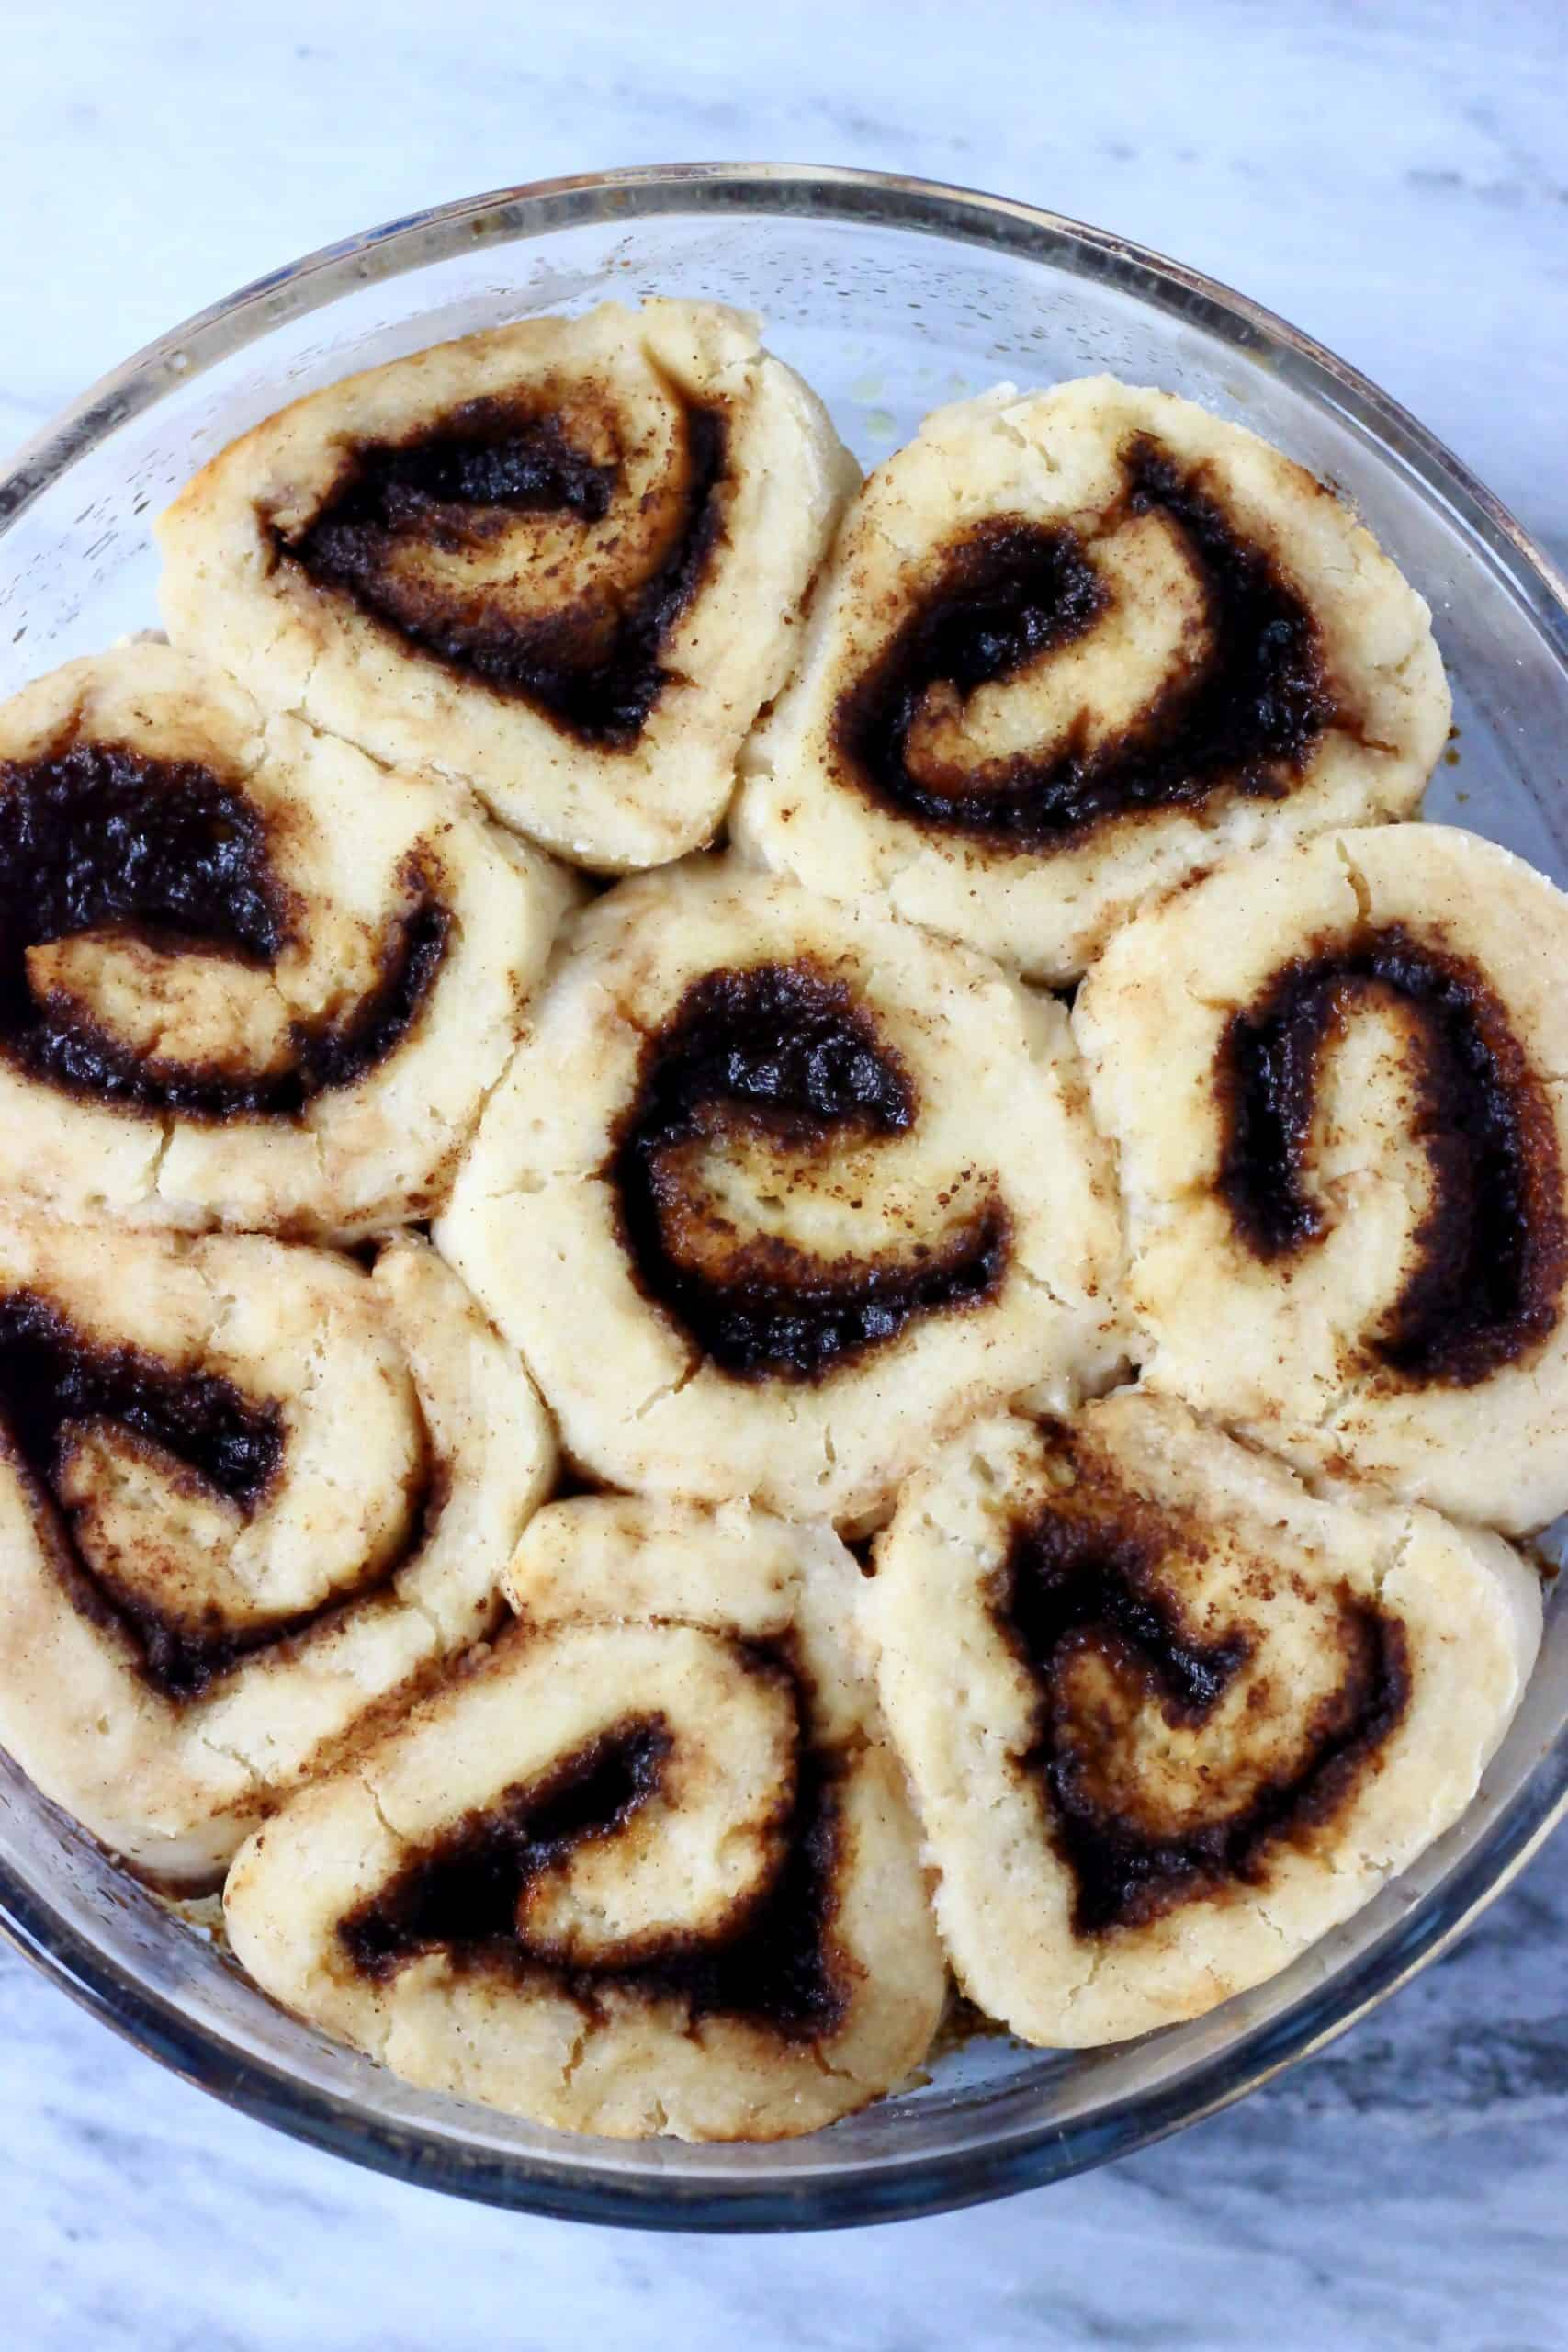 Eight gluten-free vegan cinnamon rolls in a round baking dish